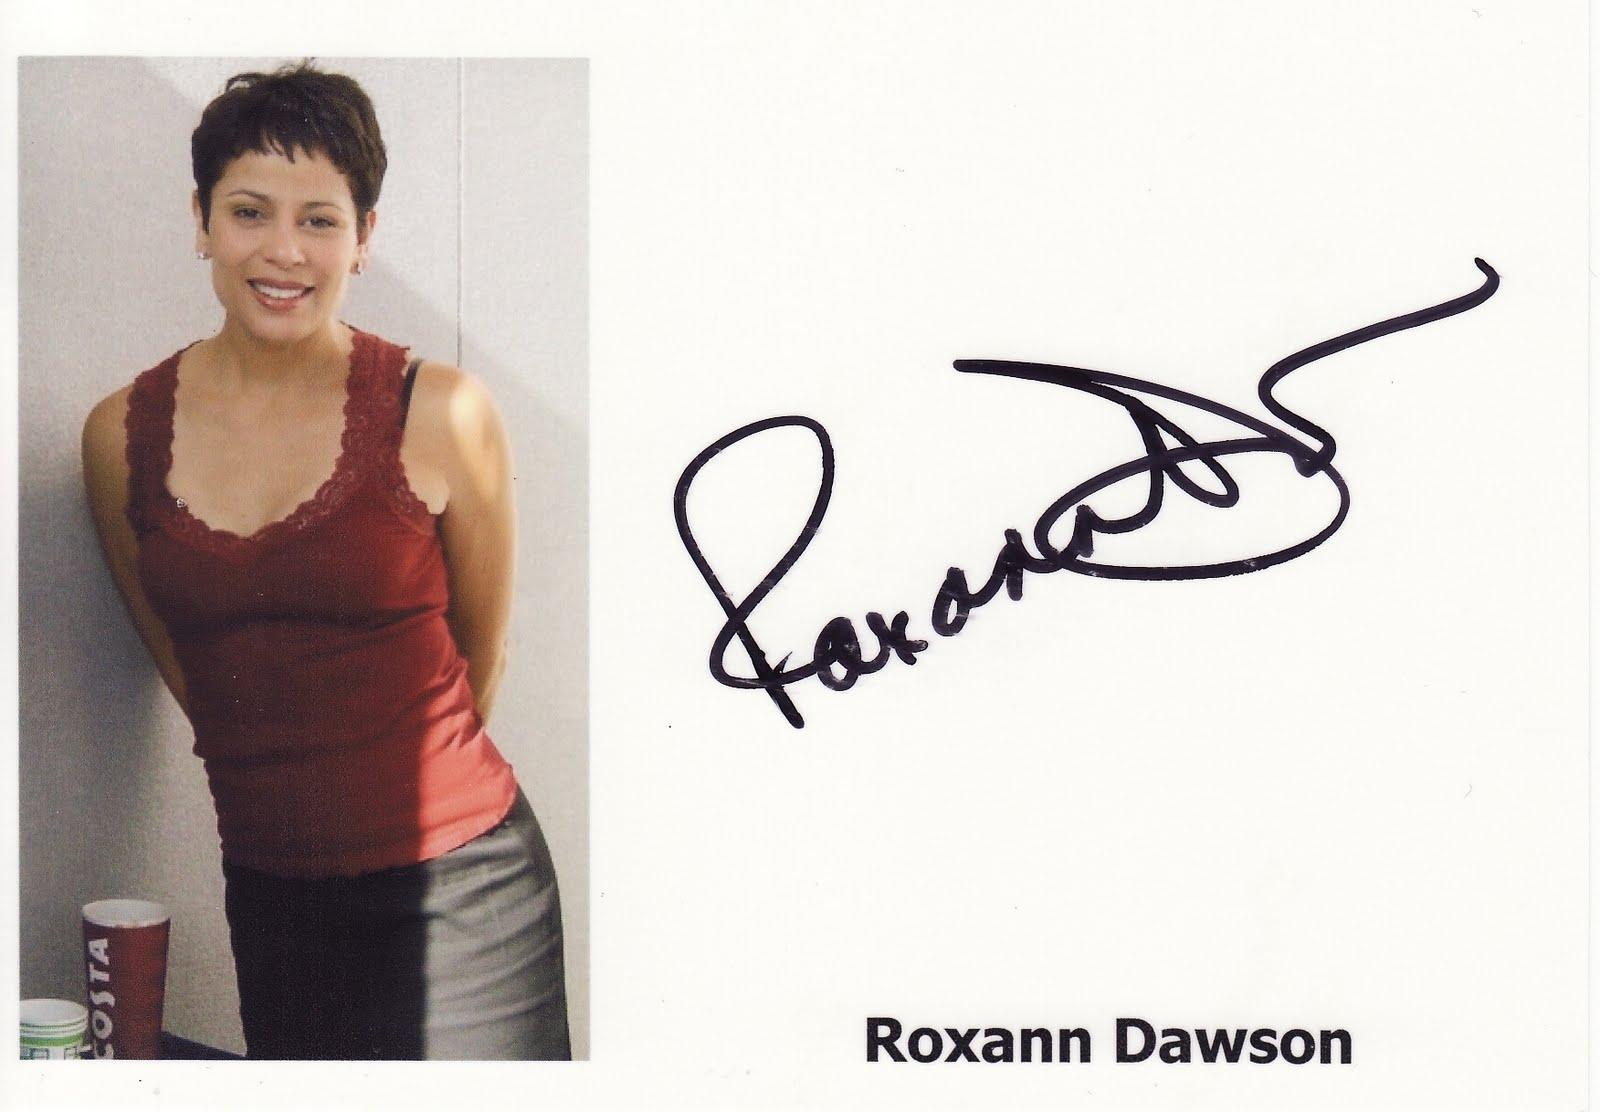 Roxann Dawson - Gallery Photo Colection